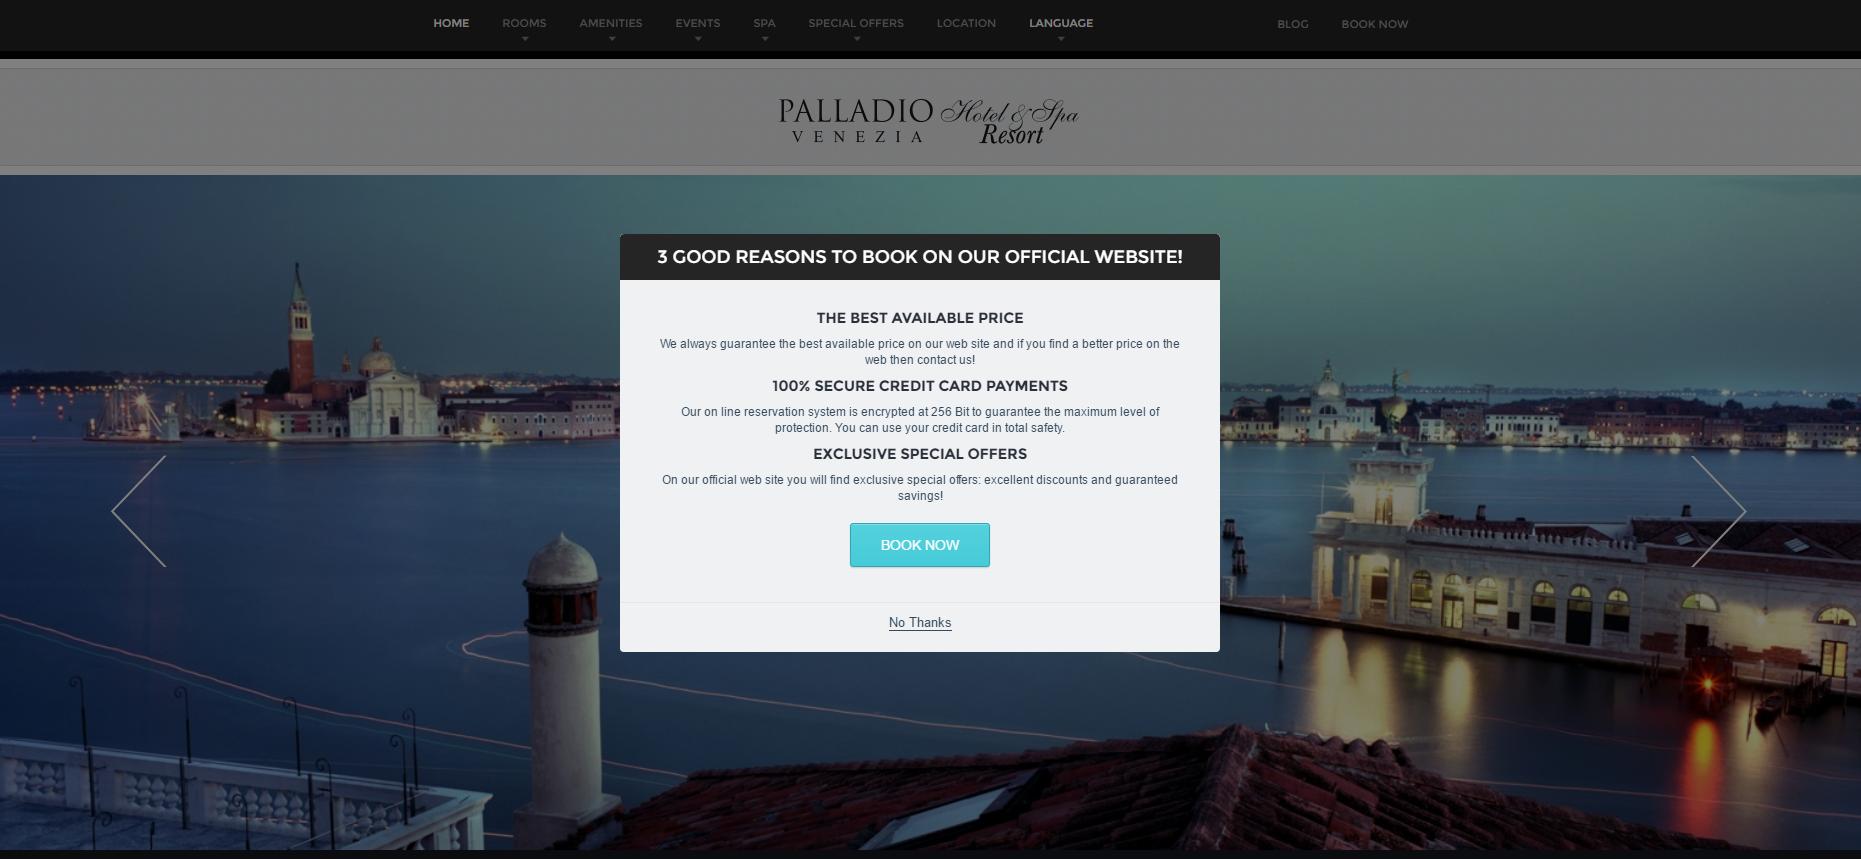 The Palladio hotel website homepage